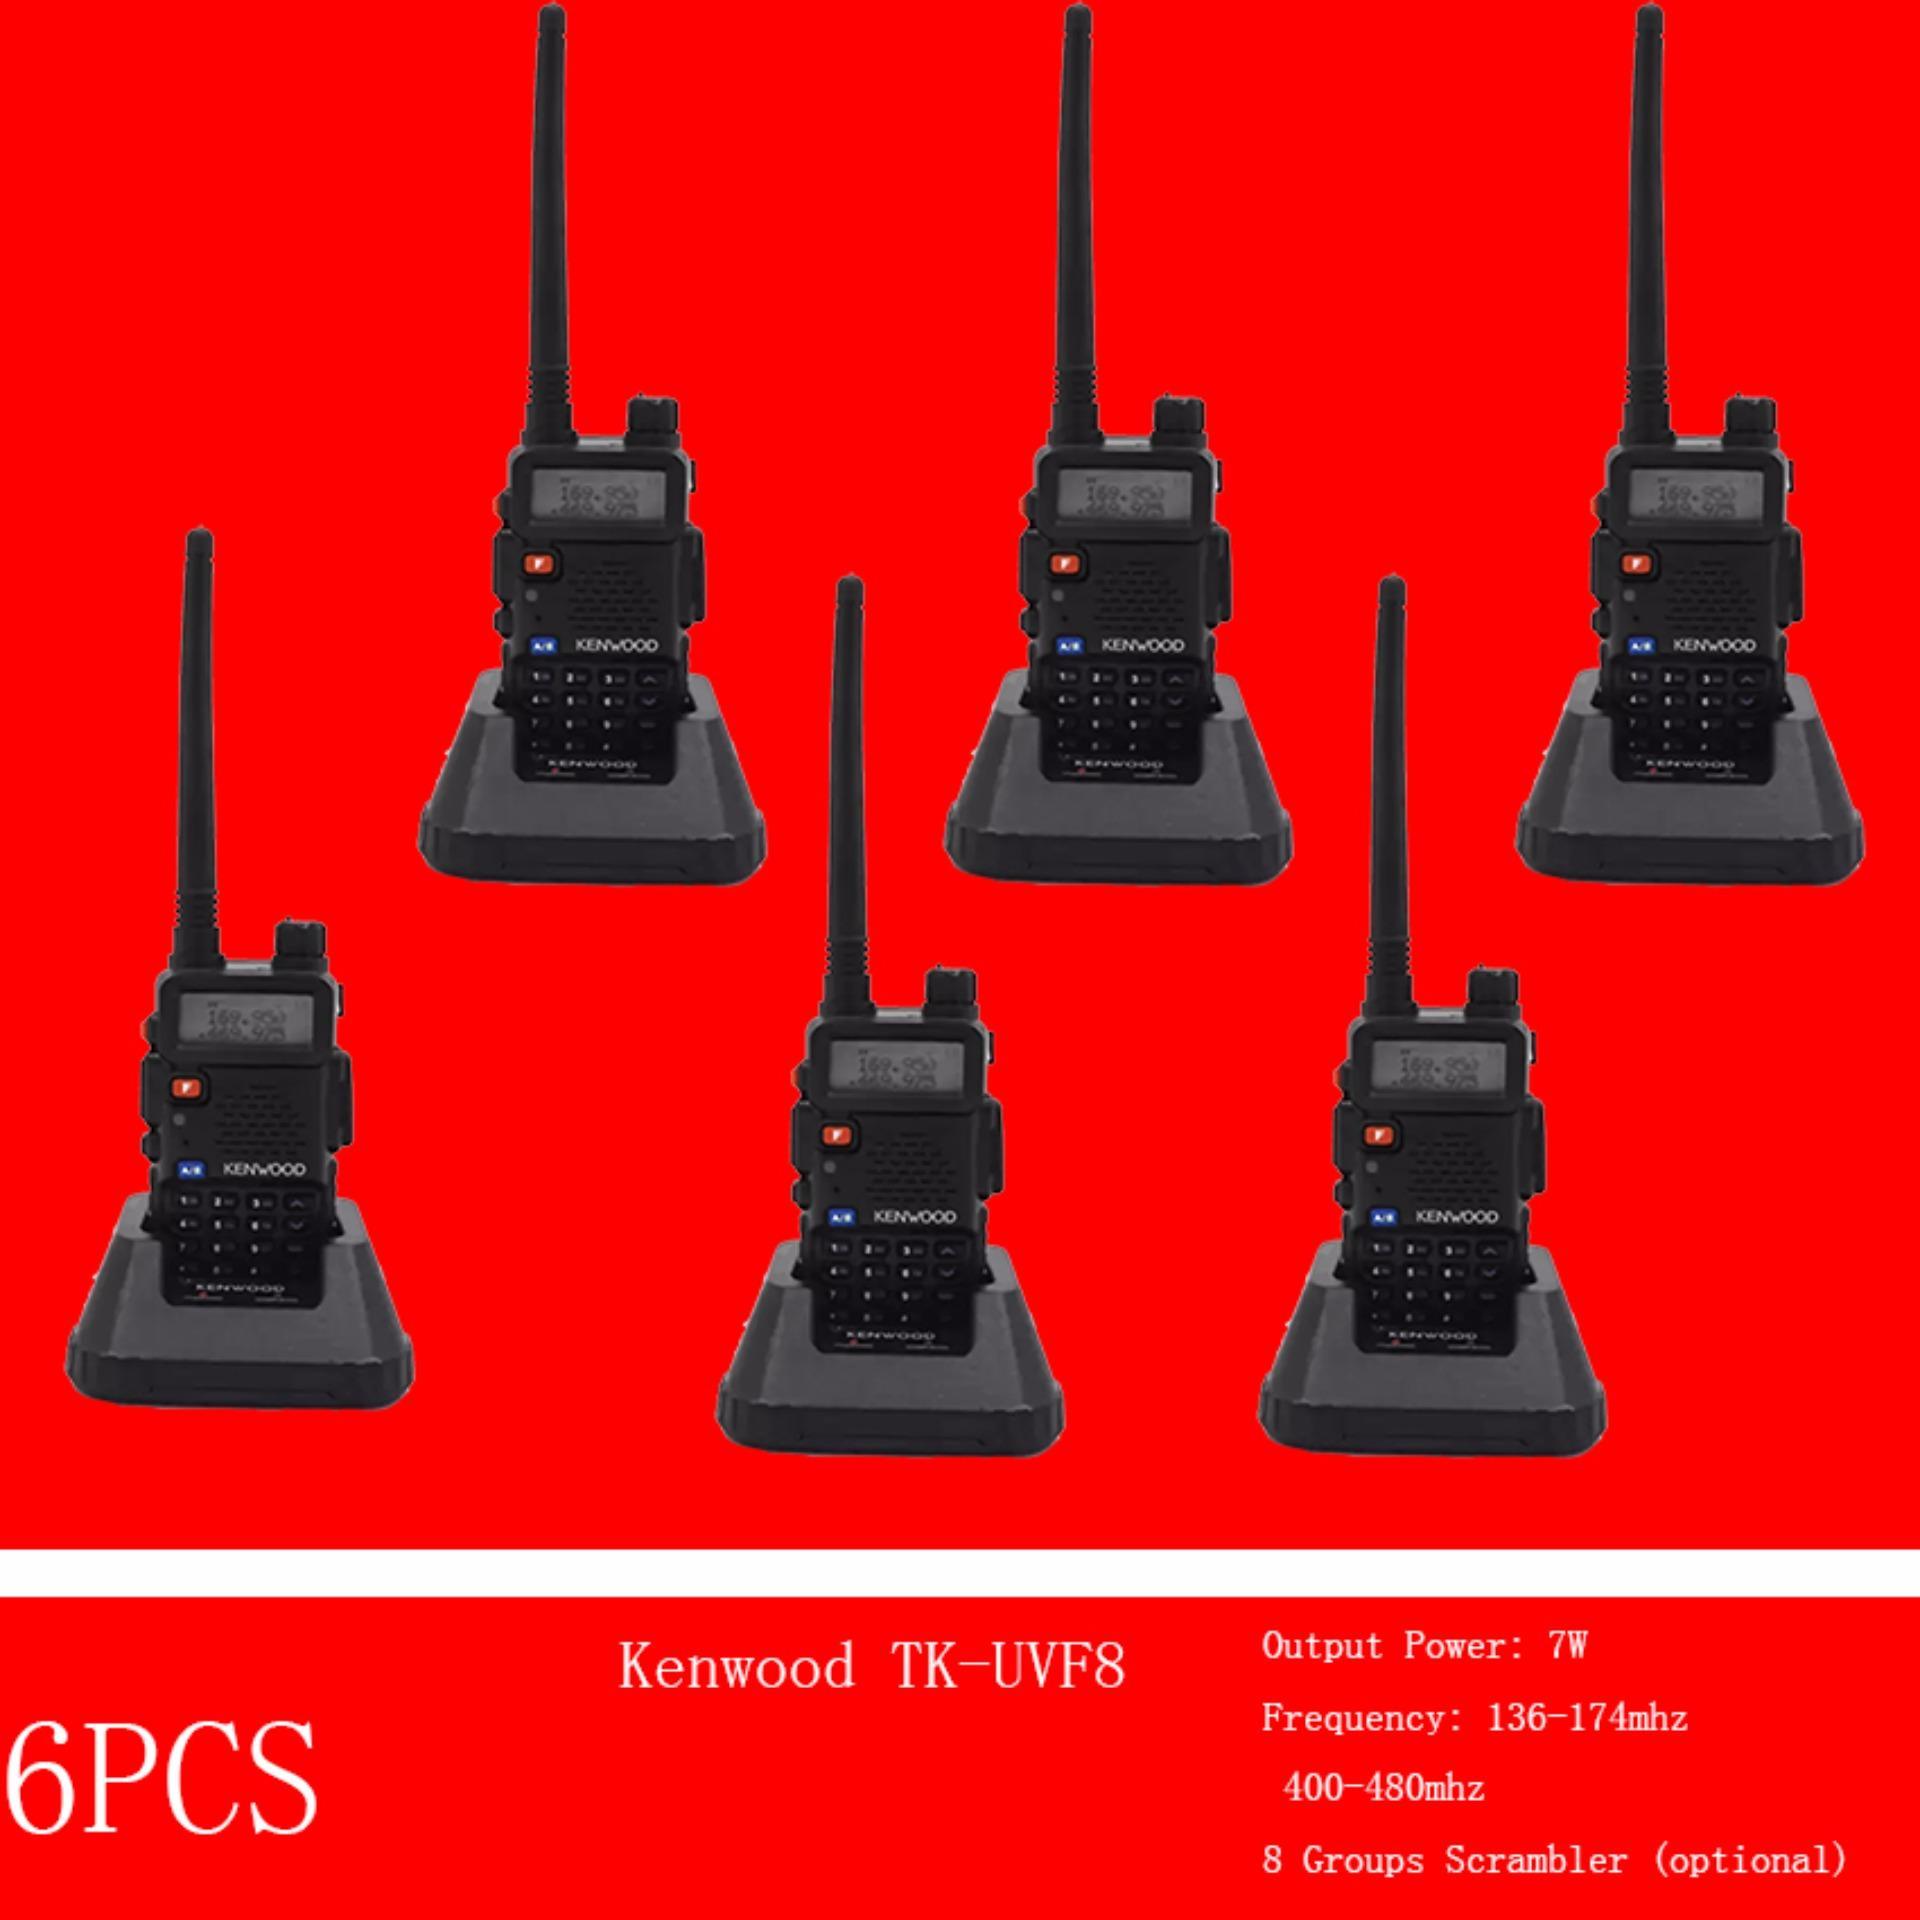 Philippines   Kenwood TK-F8 Two-Way Radio Emergency Alert